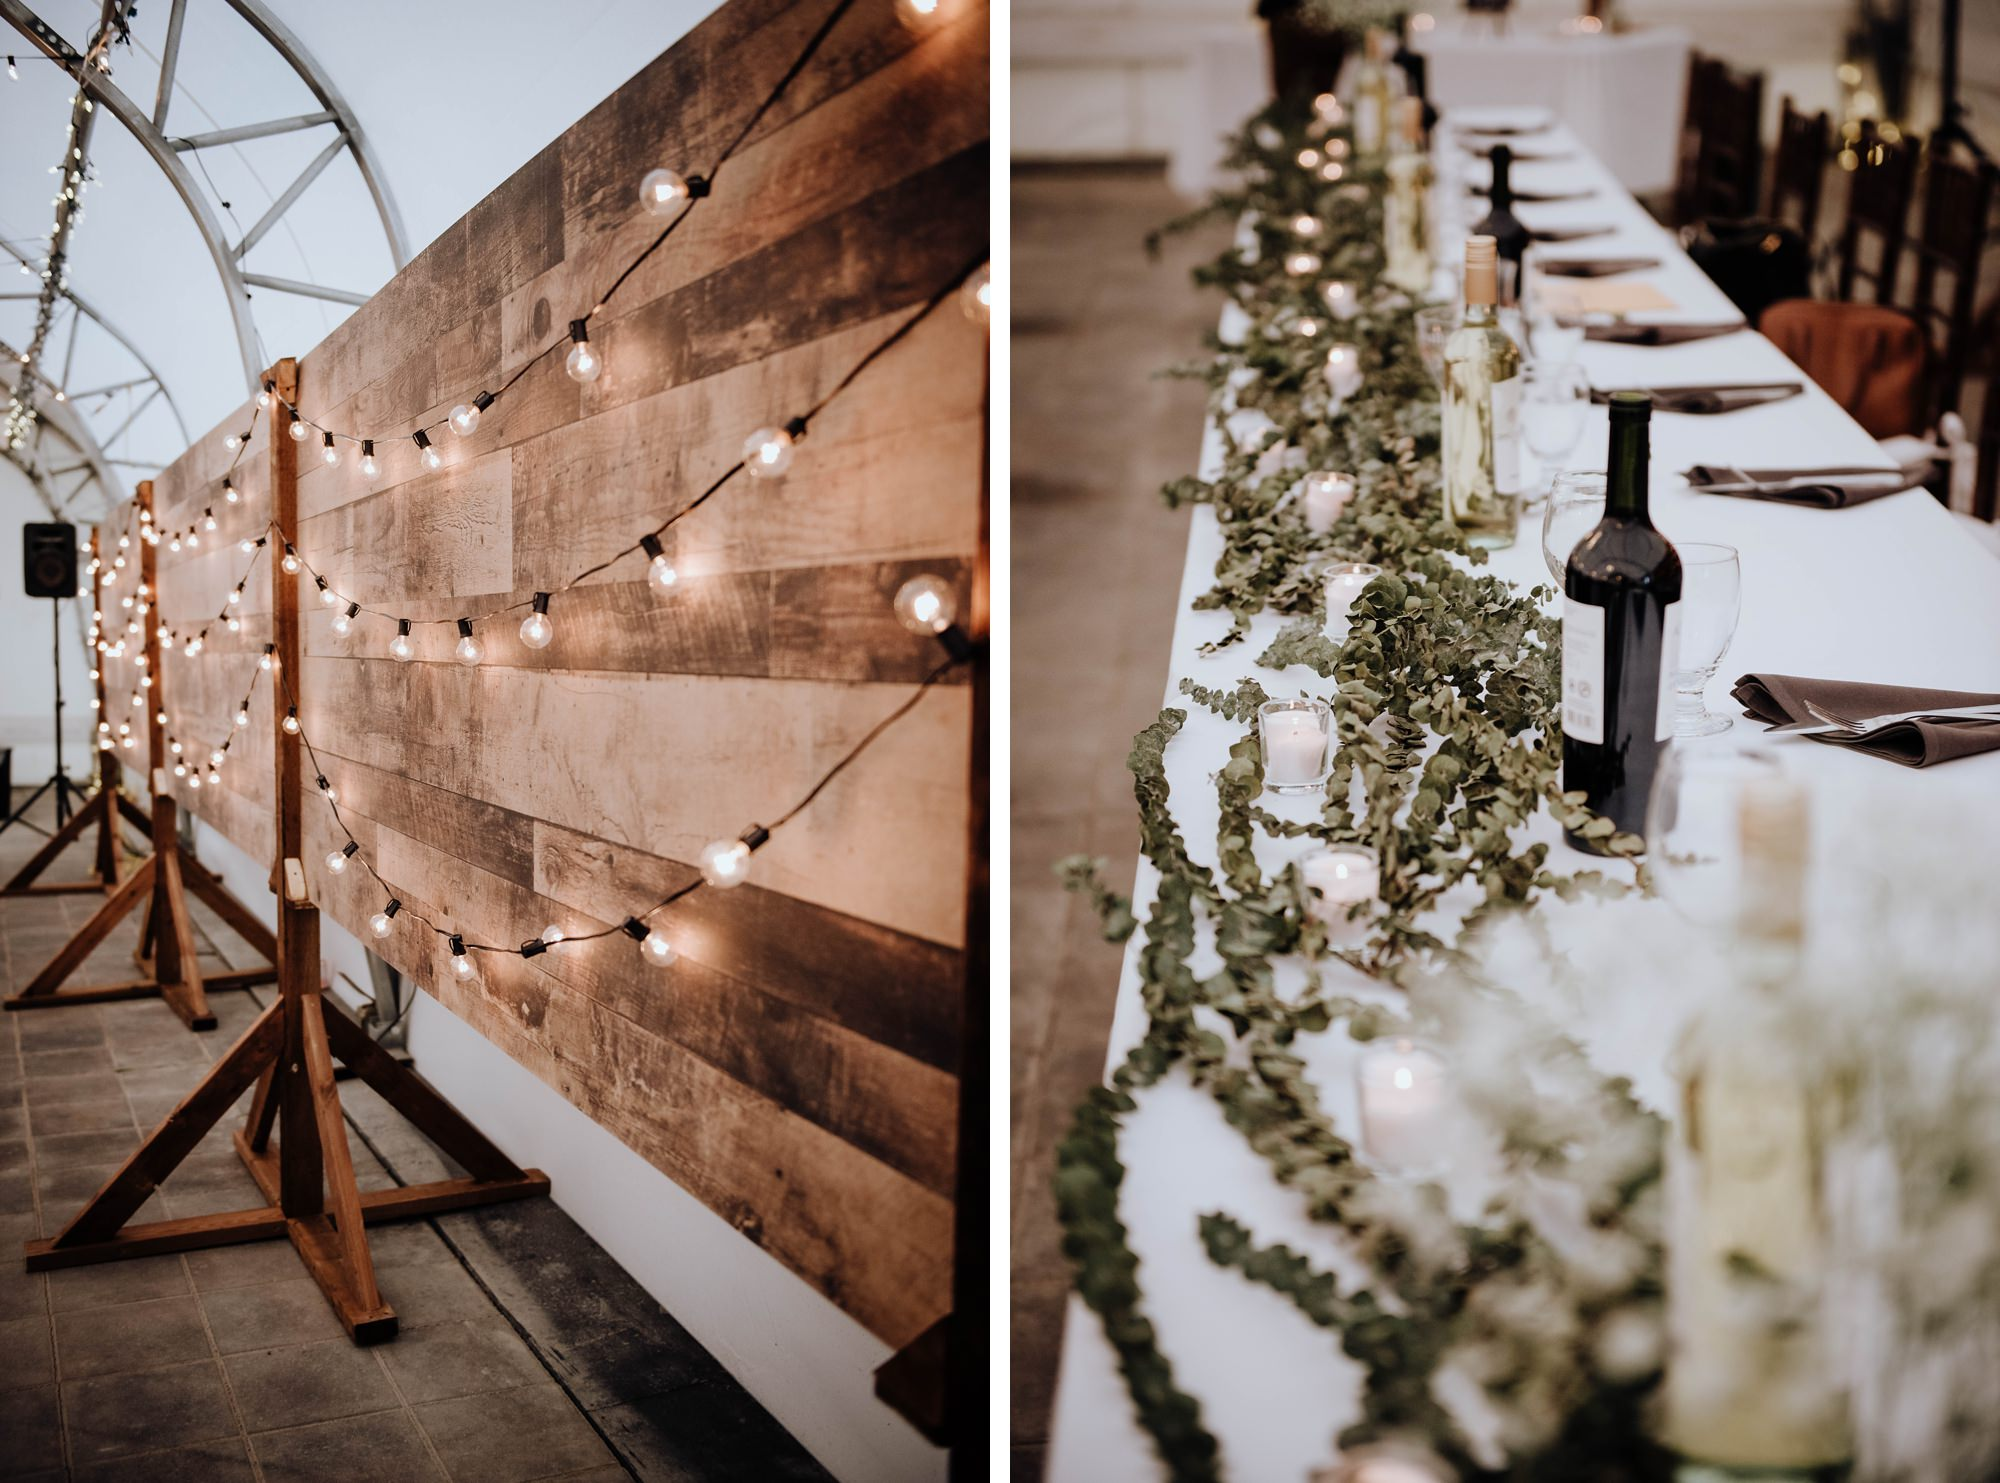 detail shots of beautiful decor at Calgary golf club wedding captured by Calgary wedding photographer